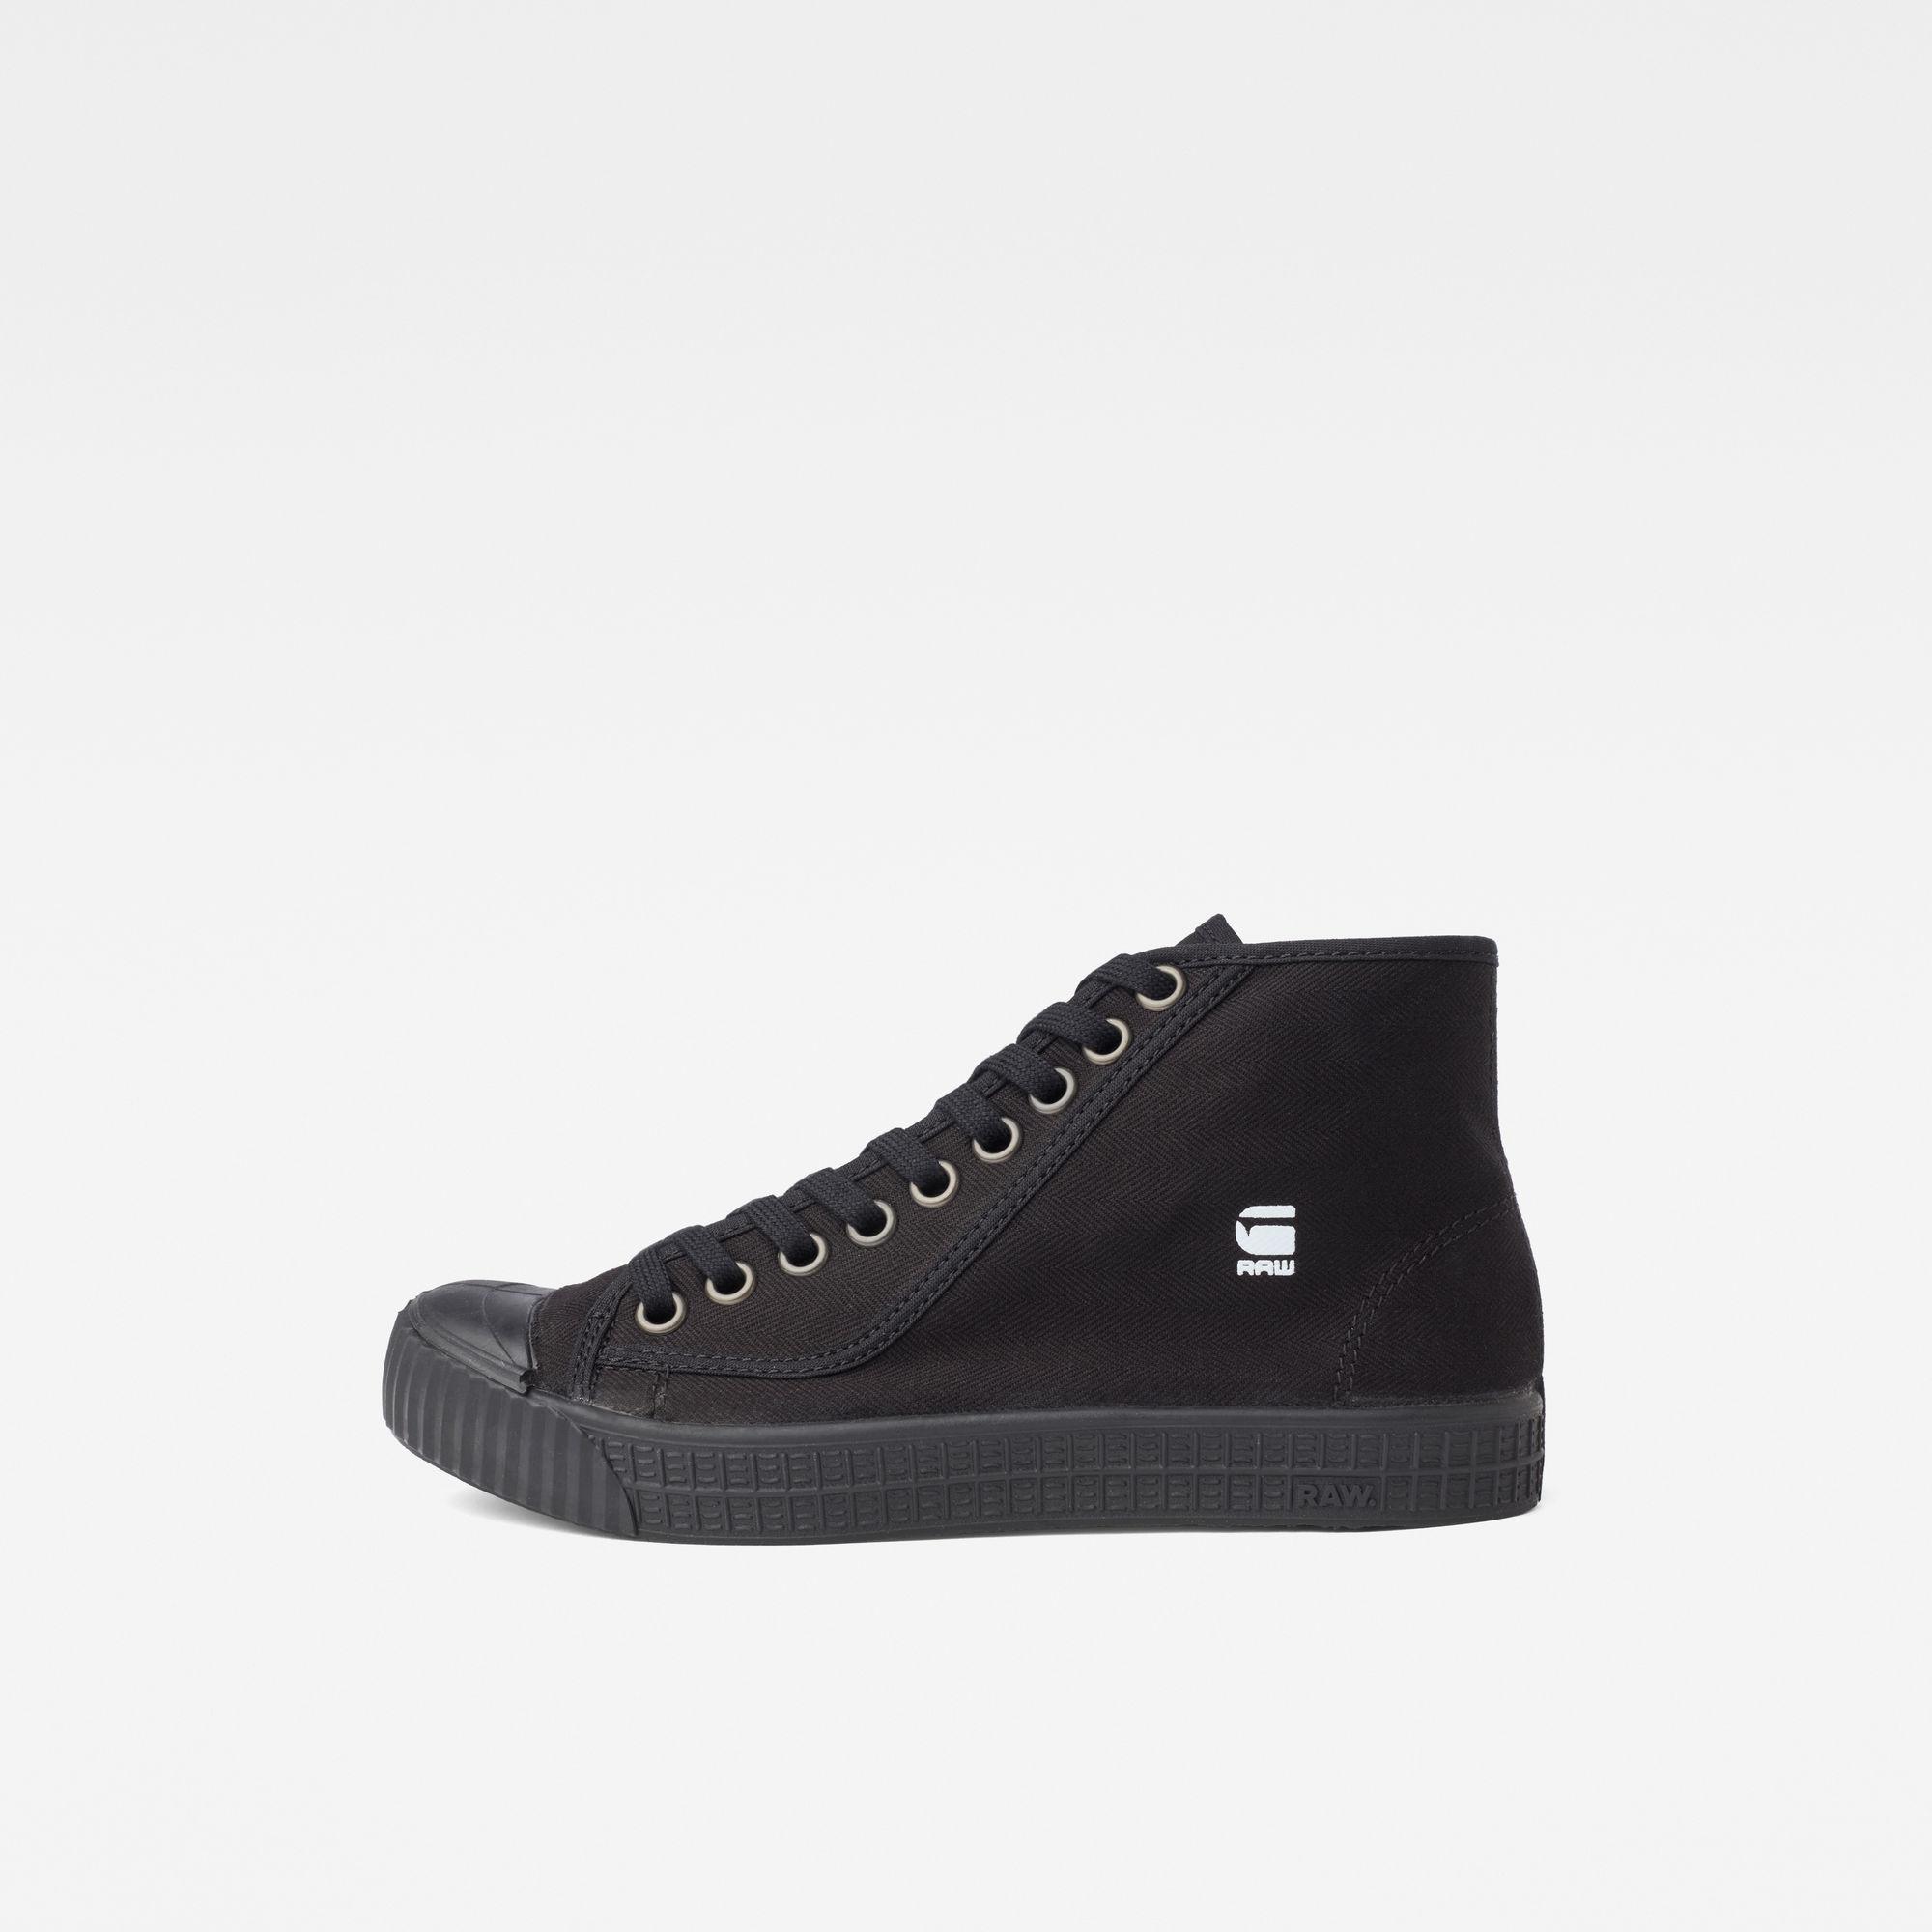 G-Star RAW Dames Rovulc HB Mid Sneakers Zwart